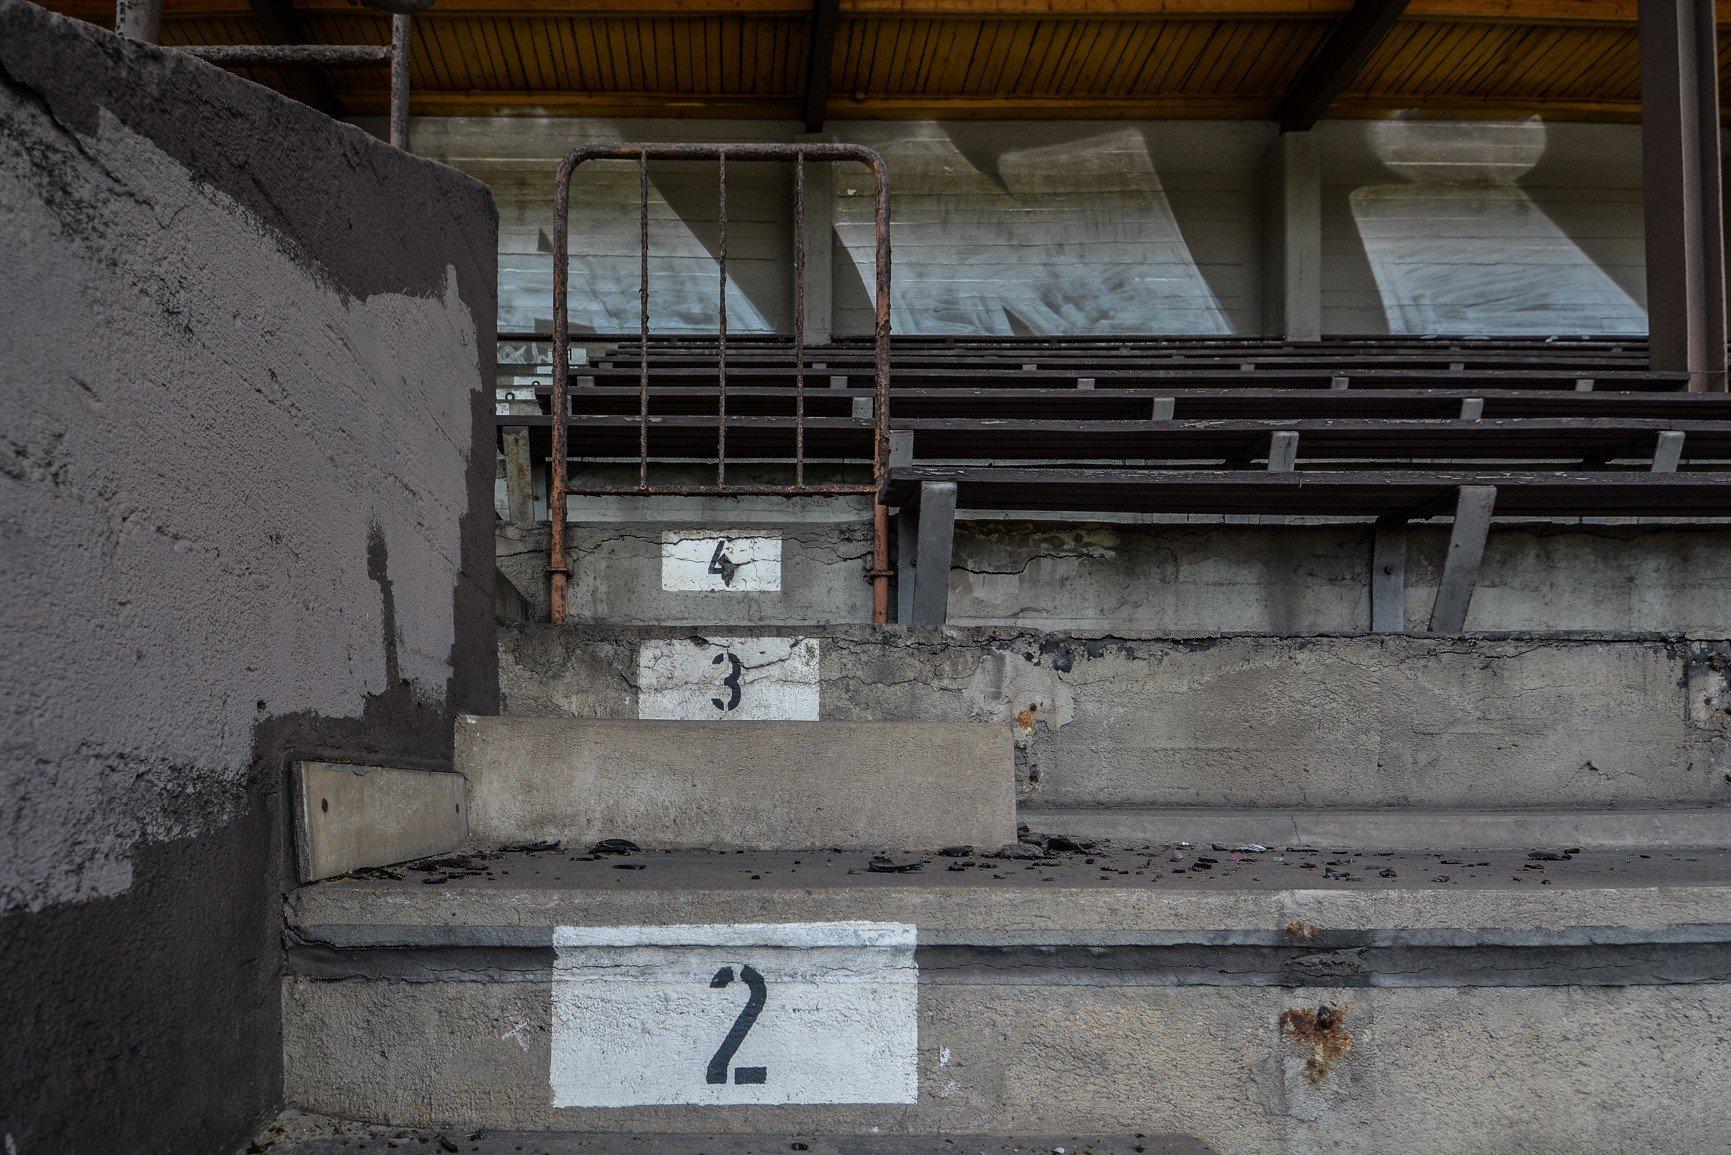 avus tribüne treppen nummer lost places abandoned berlin urbex germany